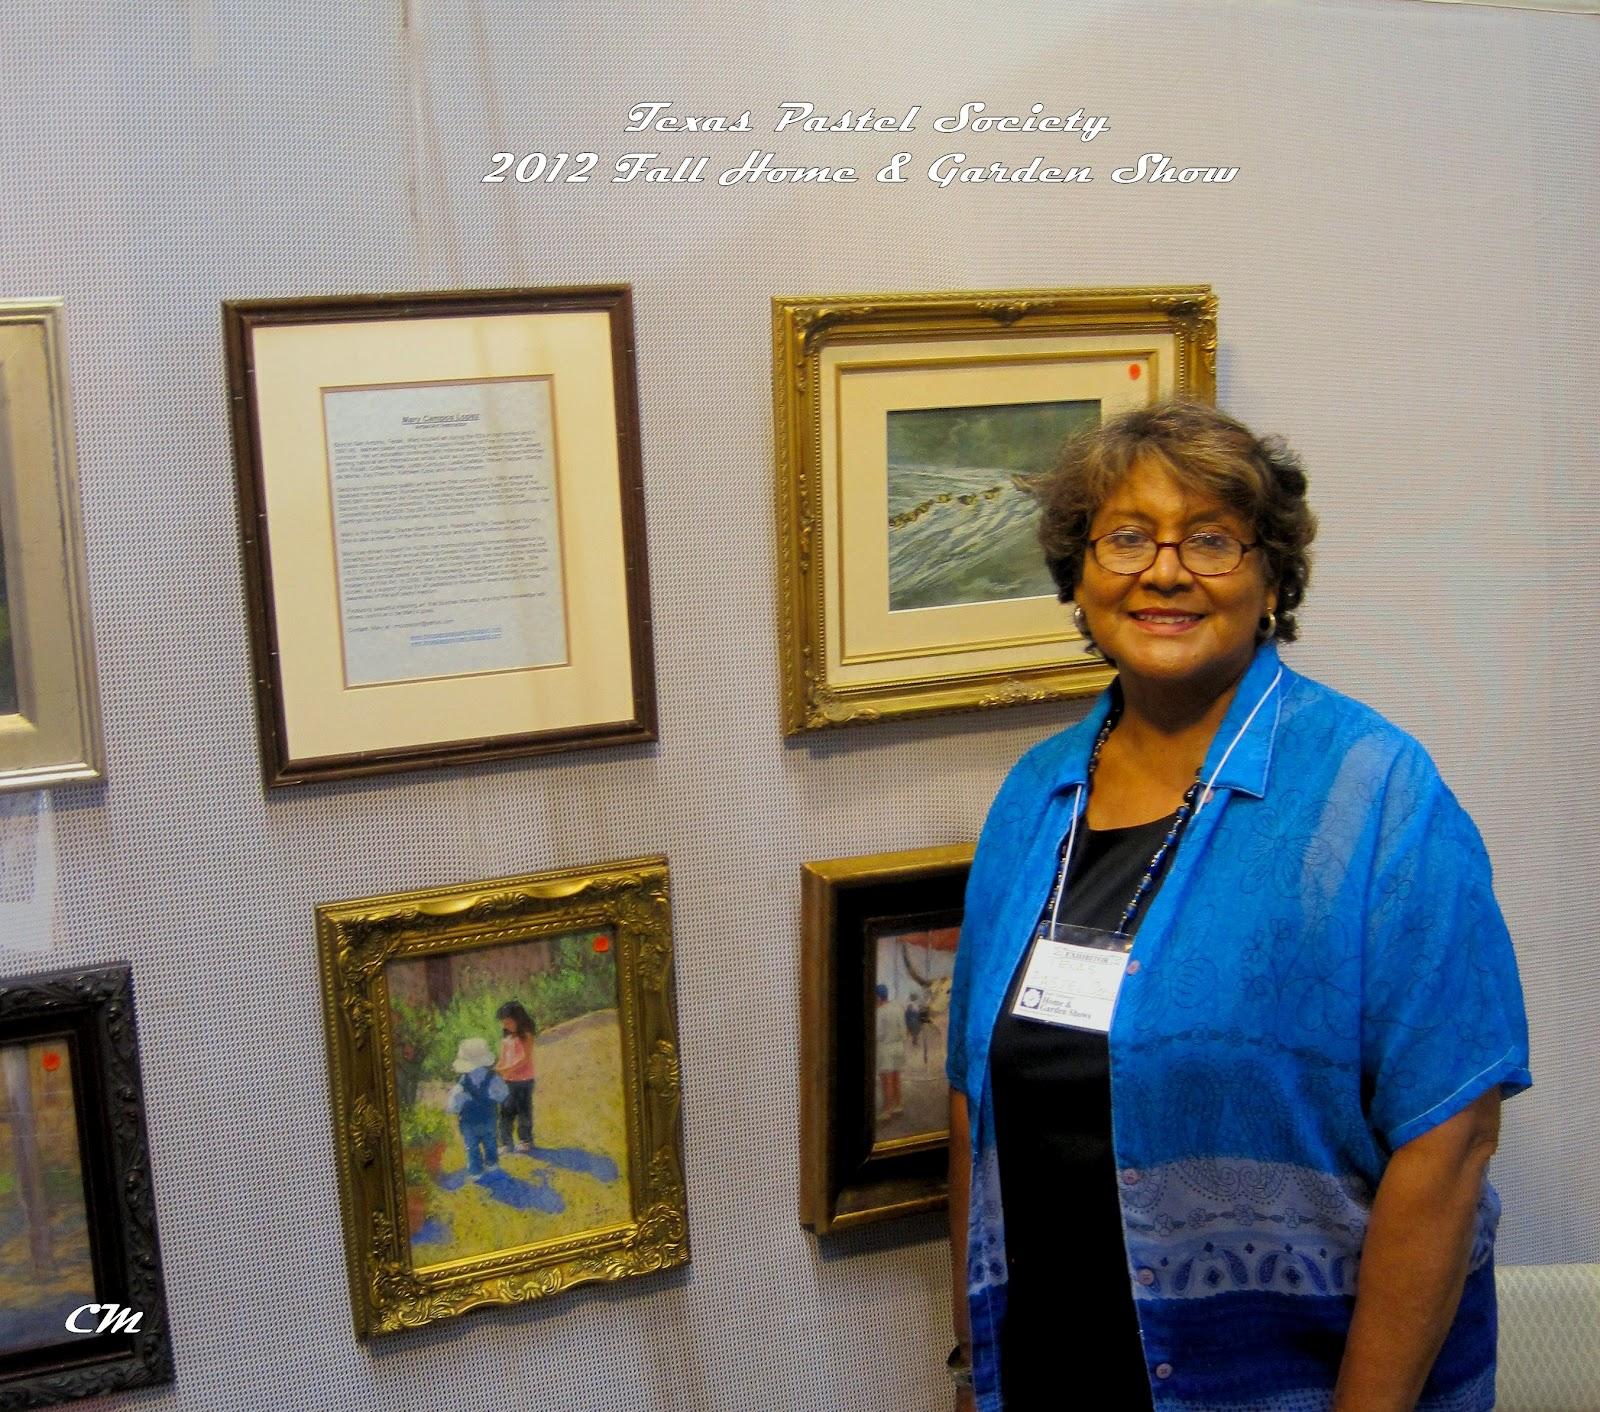 Texas Pastel Society News Txps At The San Antonio Home And Garden Show